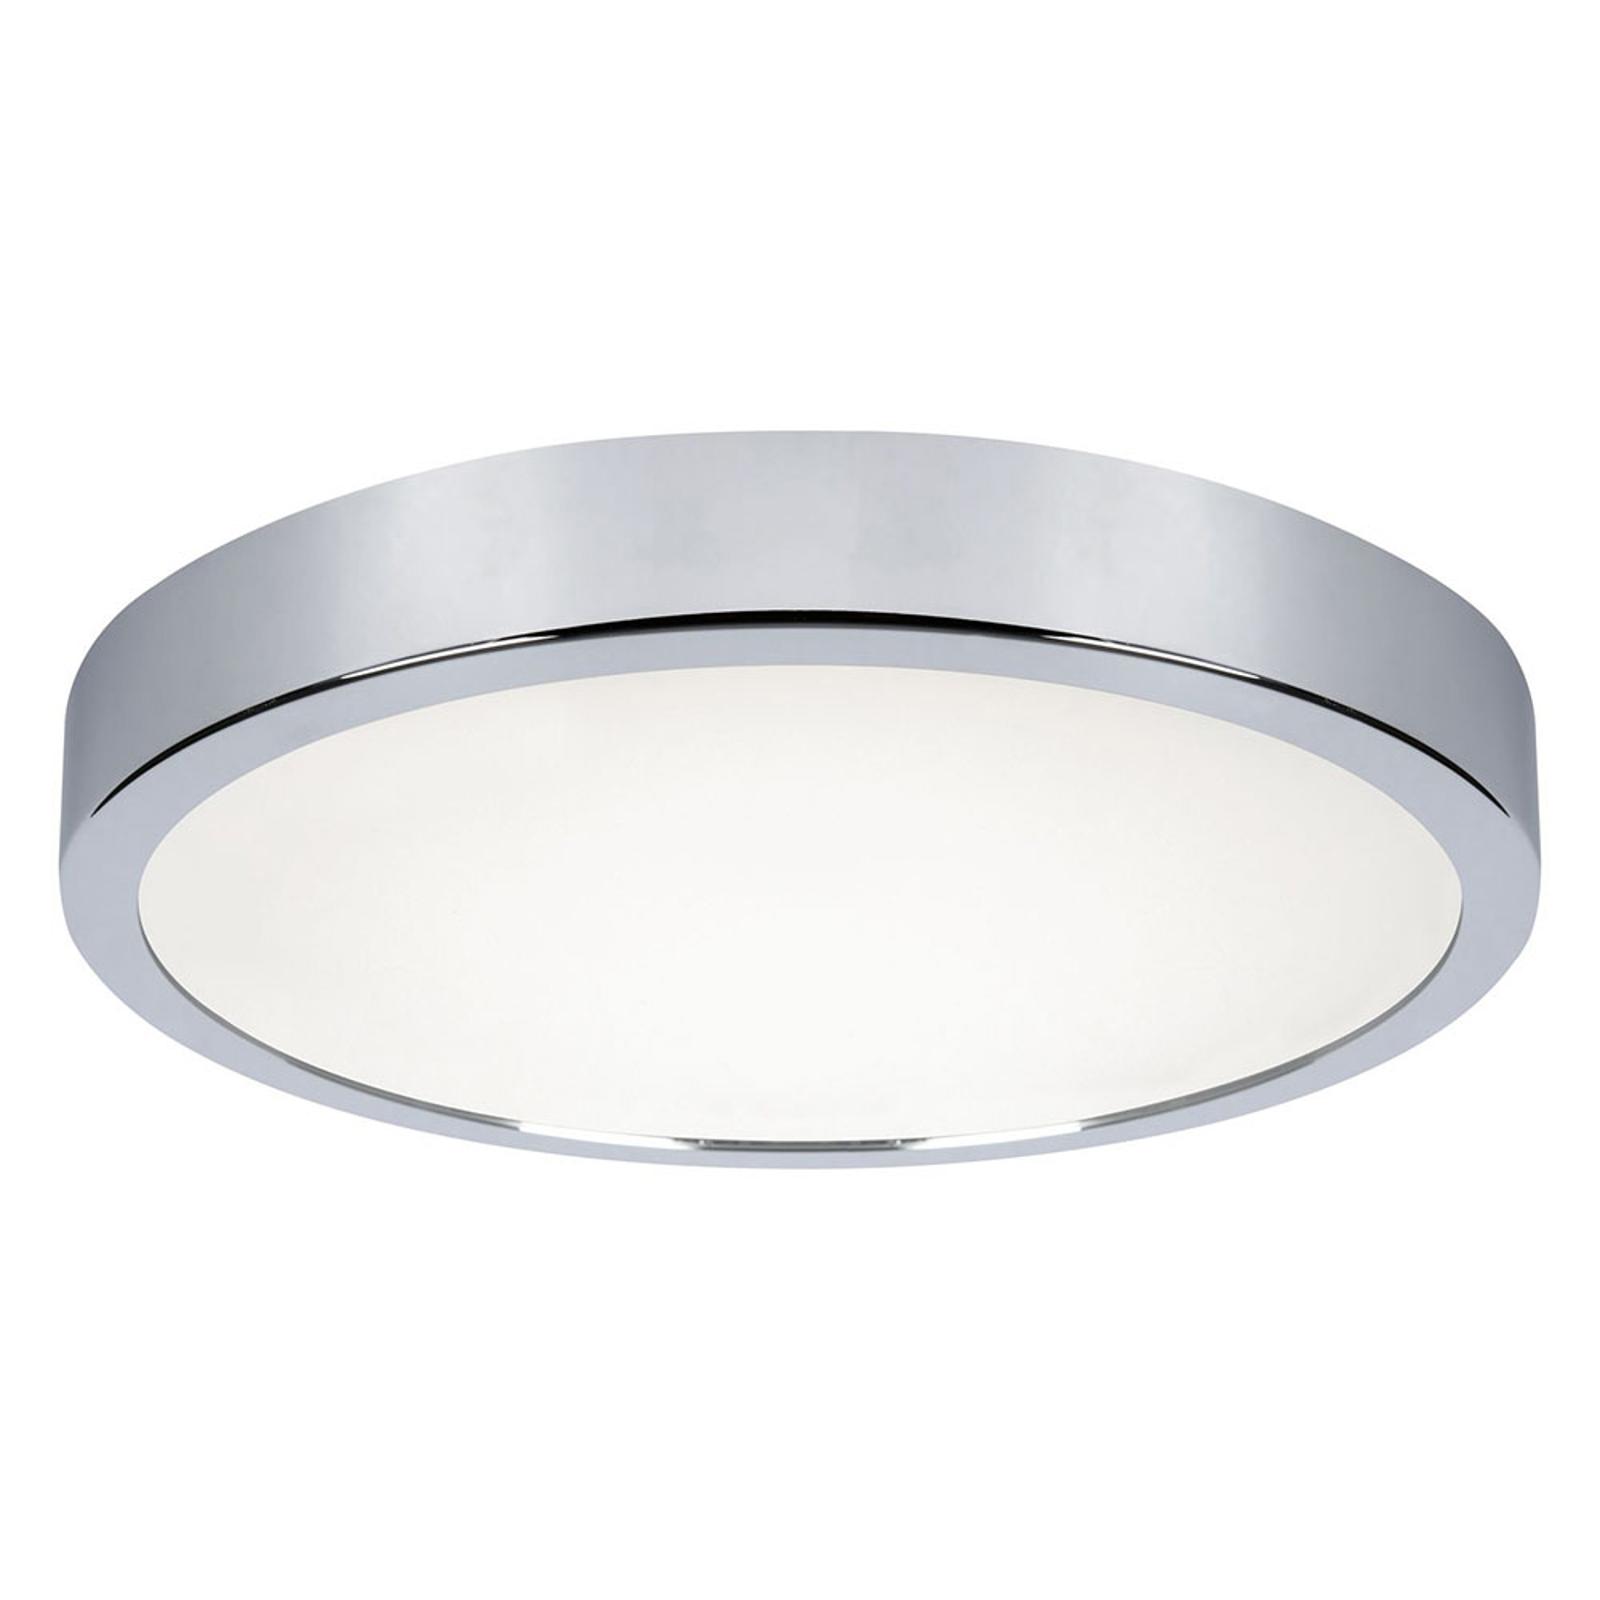 Paulmann Aviar LED-Deckenlampe WhiteSwitch Ø 30cm